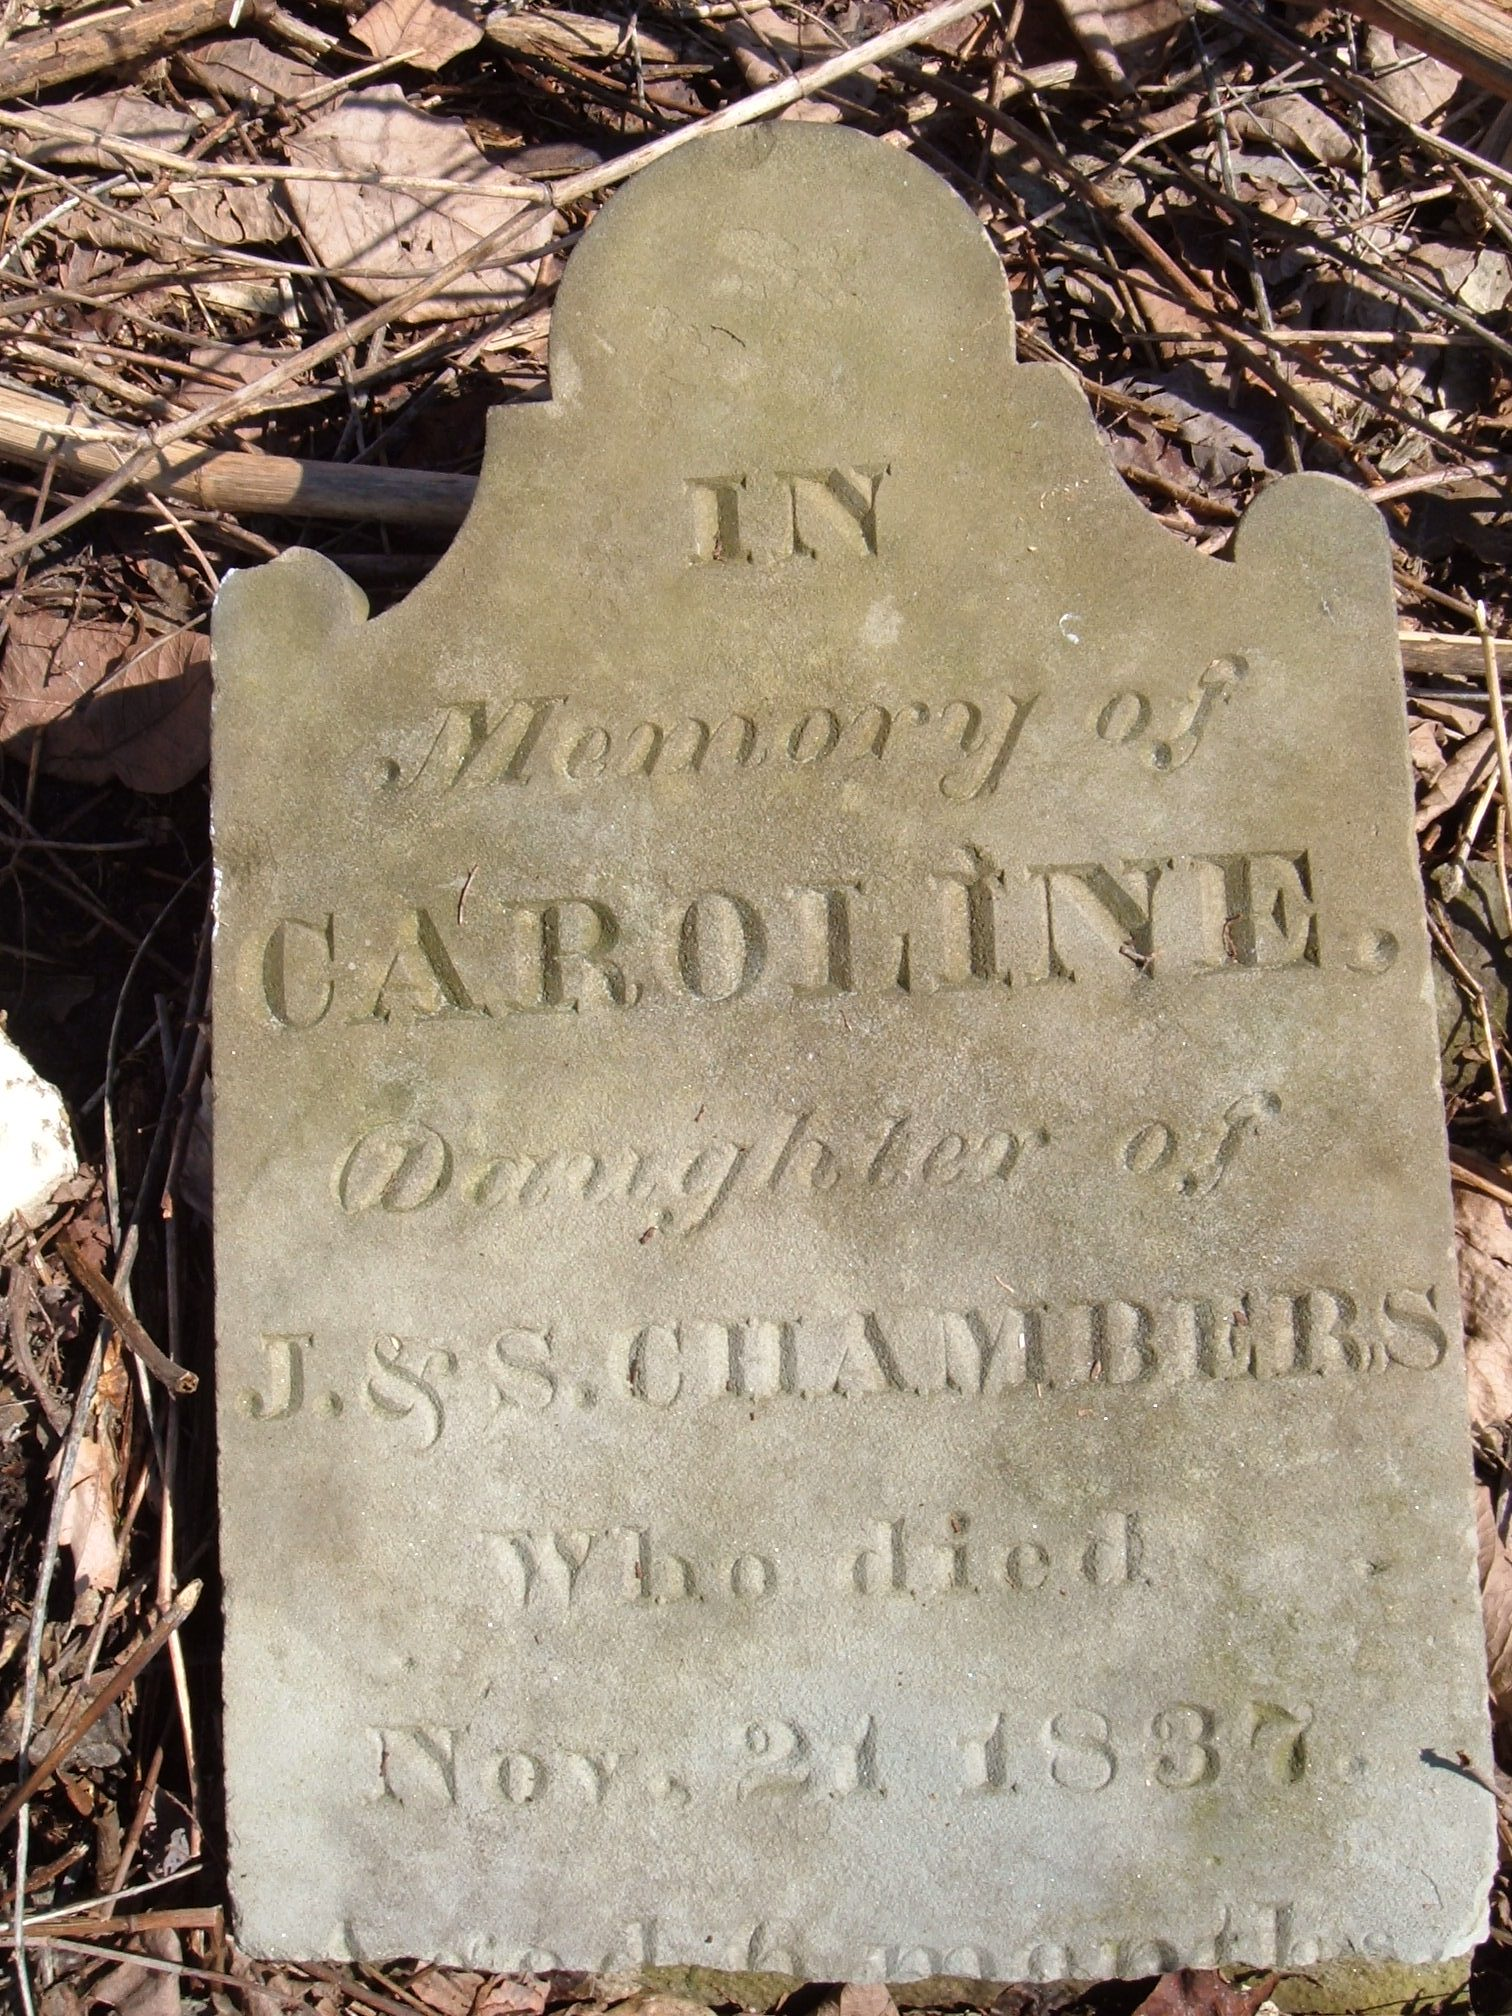 Caroline Chambers